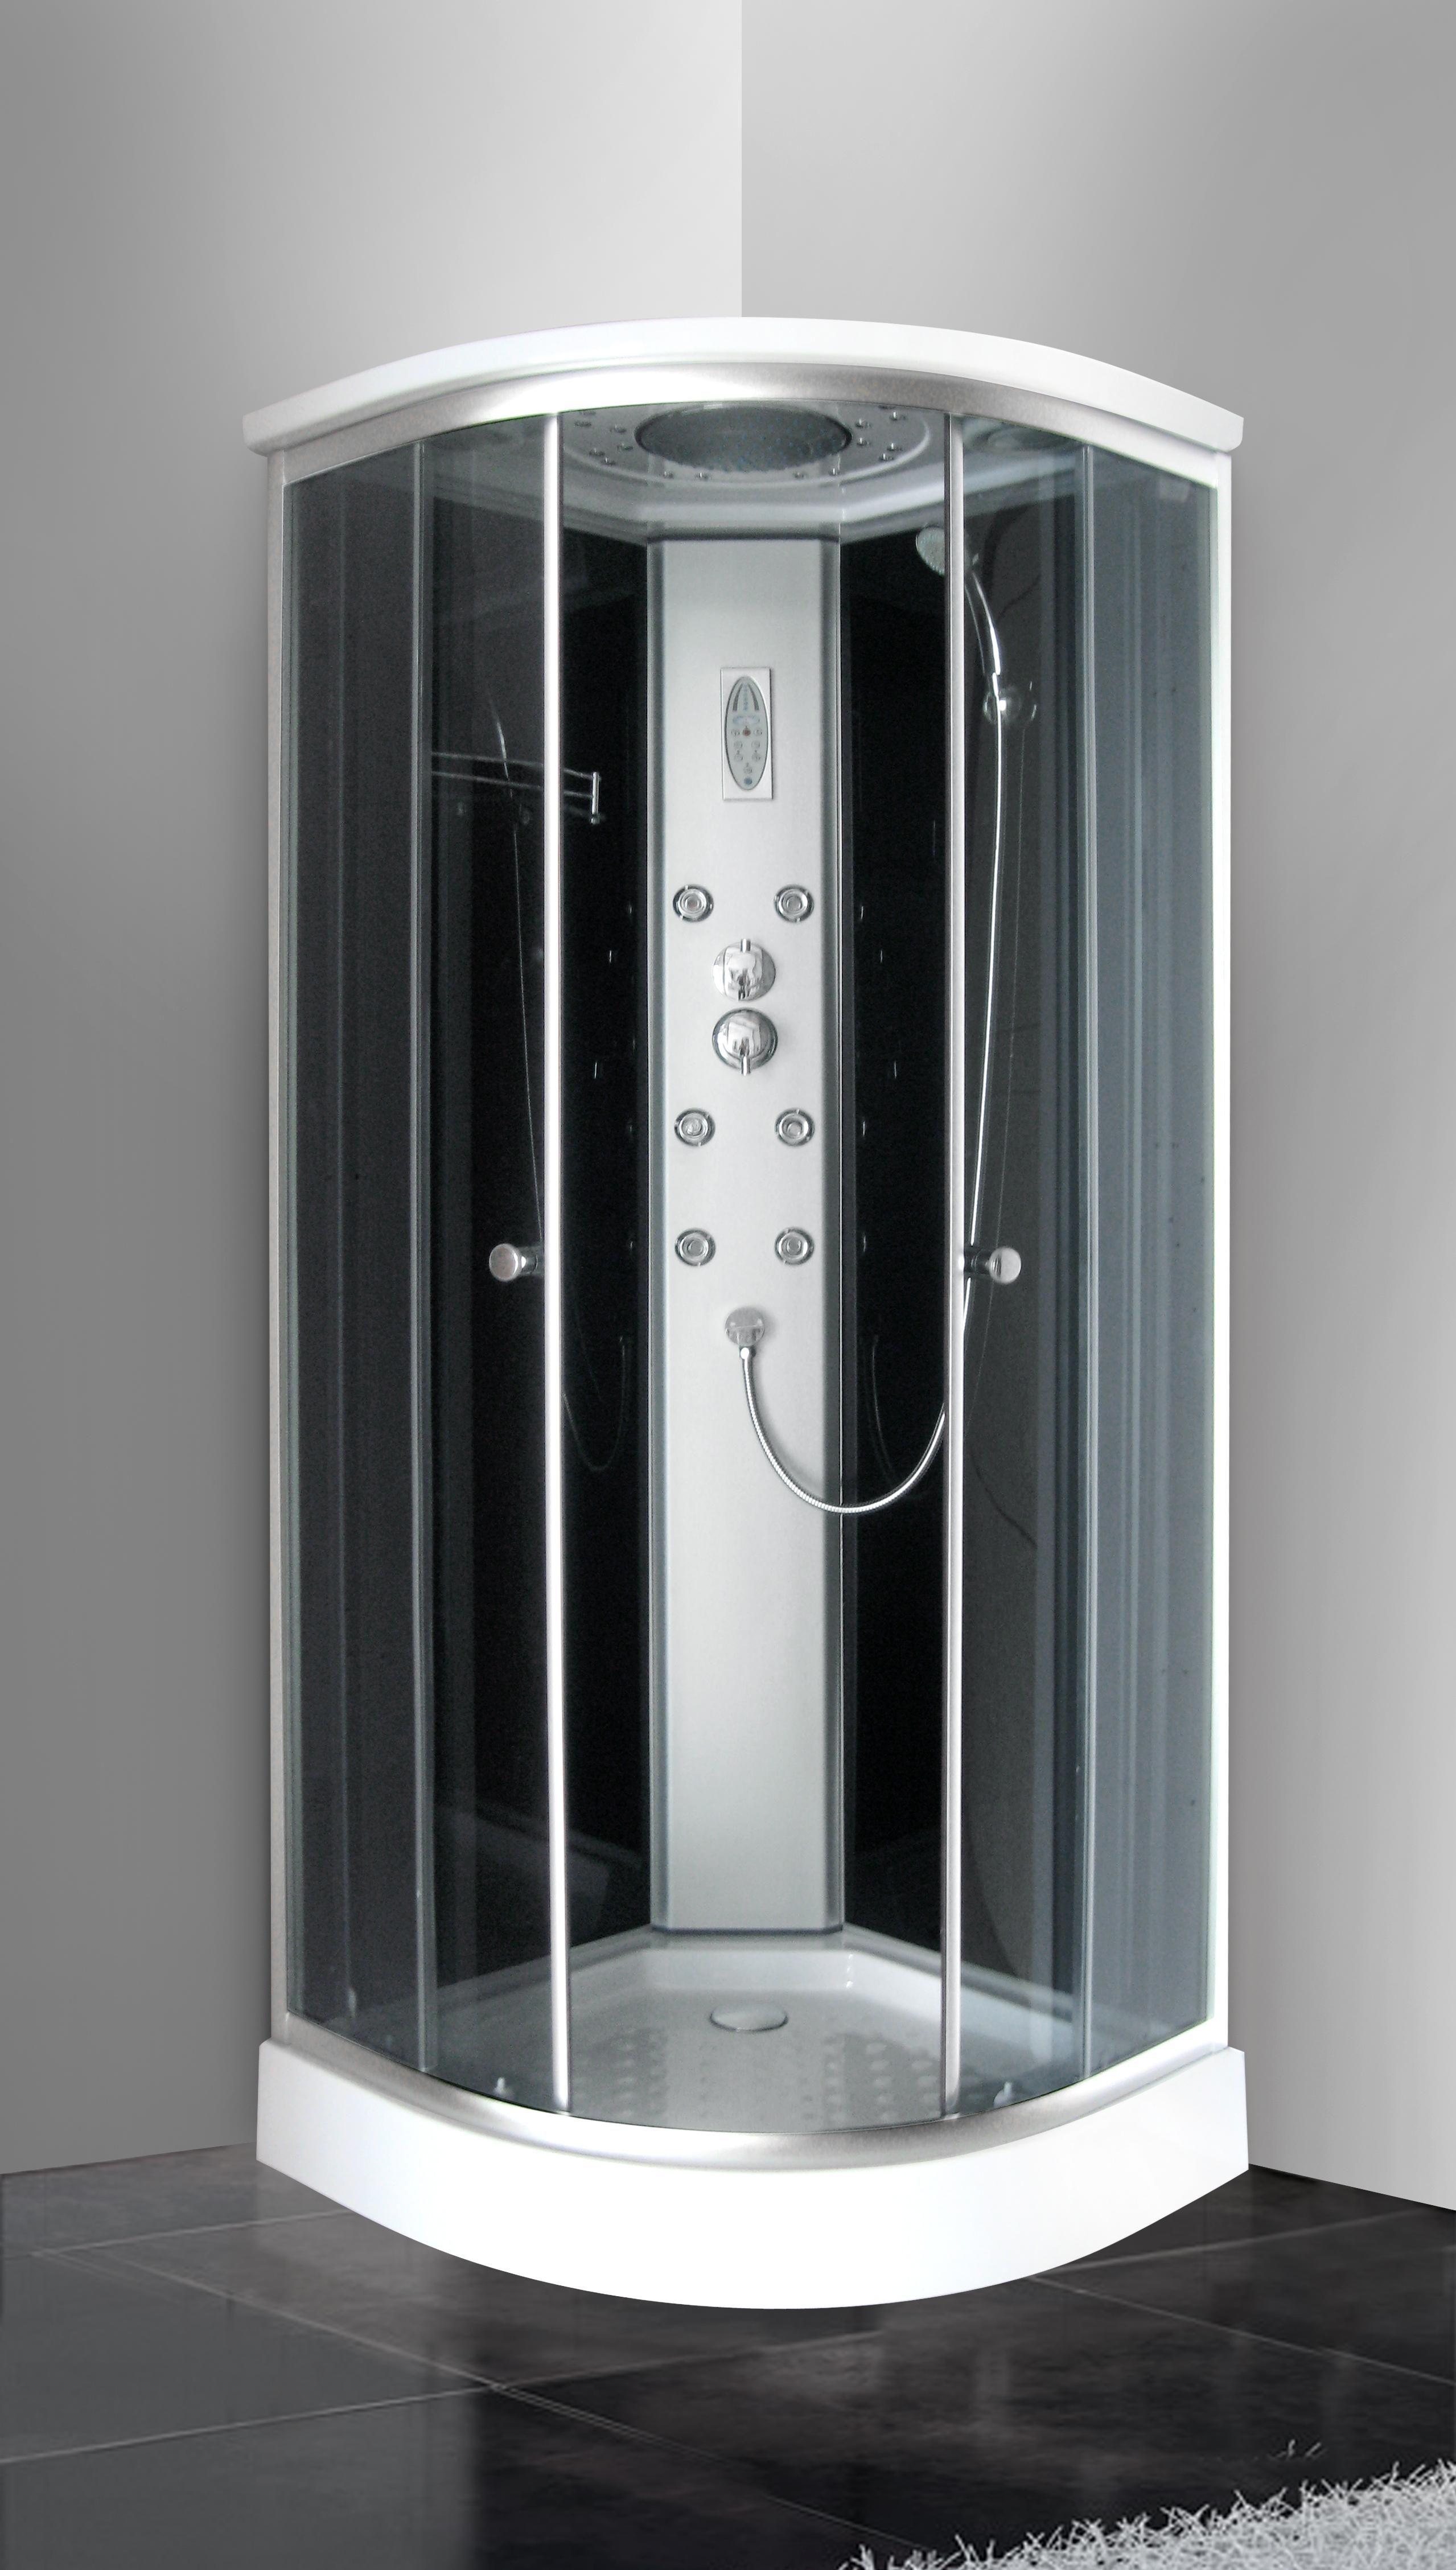 Vasca idromassaggio glass prezzi - Cabina doccia teuco prezzi ...